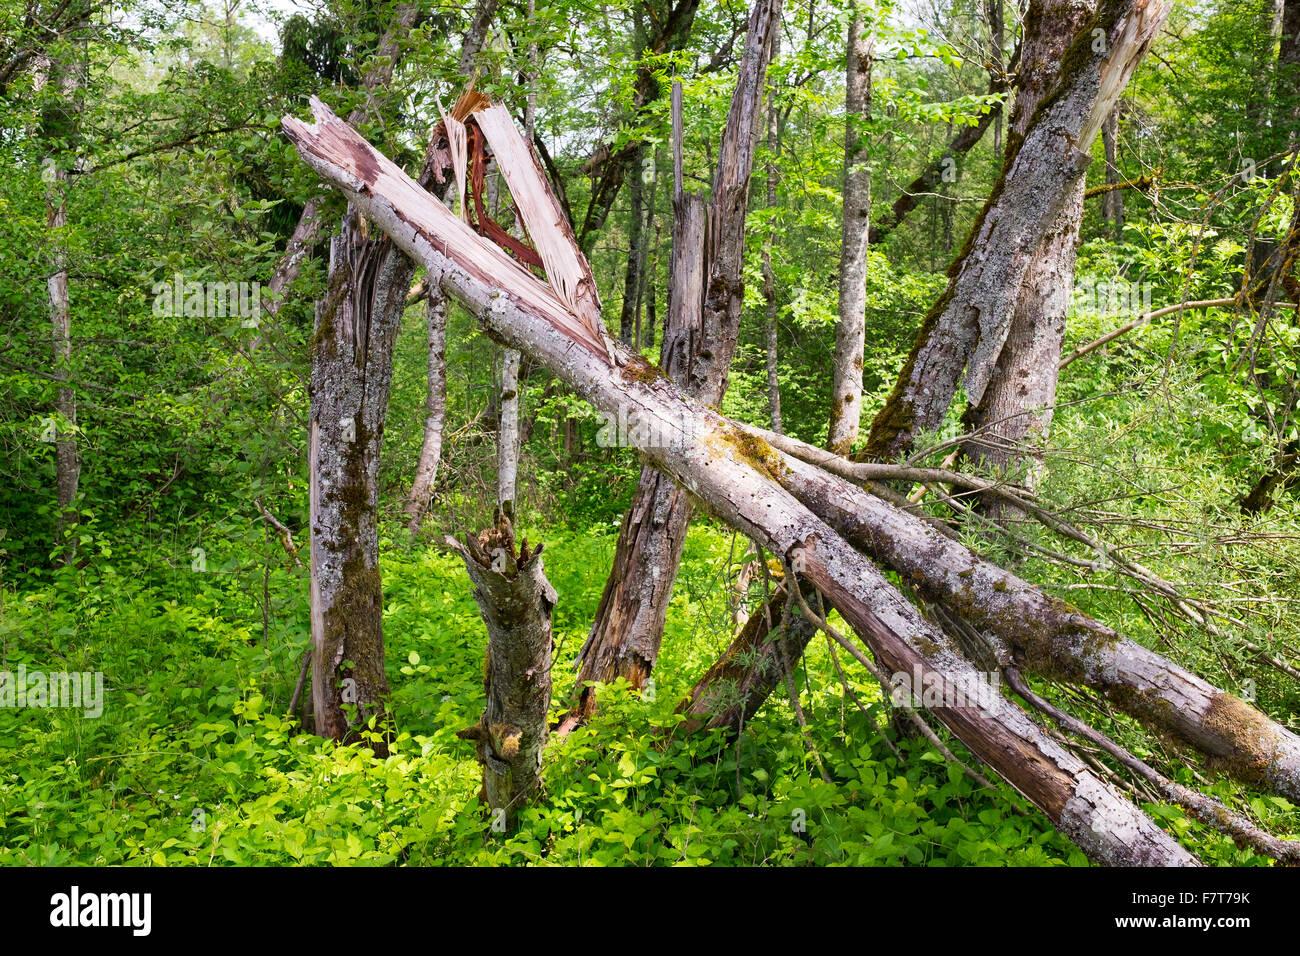 Riparian forest, Isarauen nature reserve, Pupplinger Au, Upper Bavaria, Bavaria, Germany - Stock Image